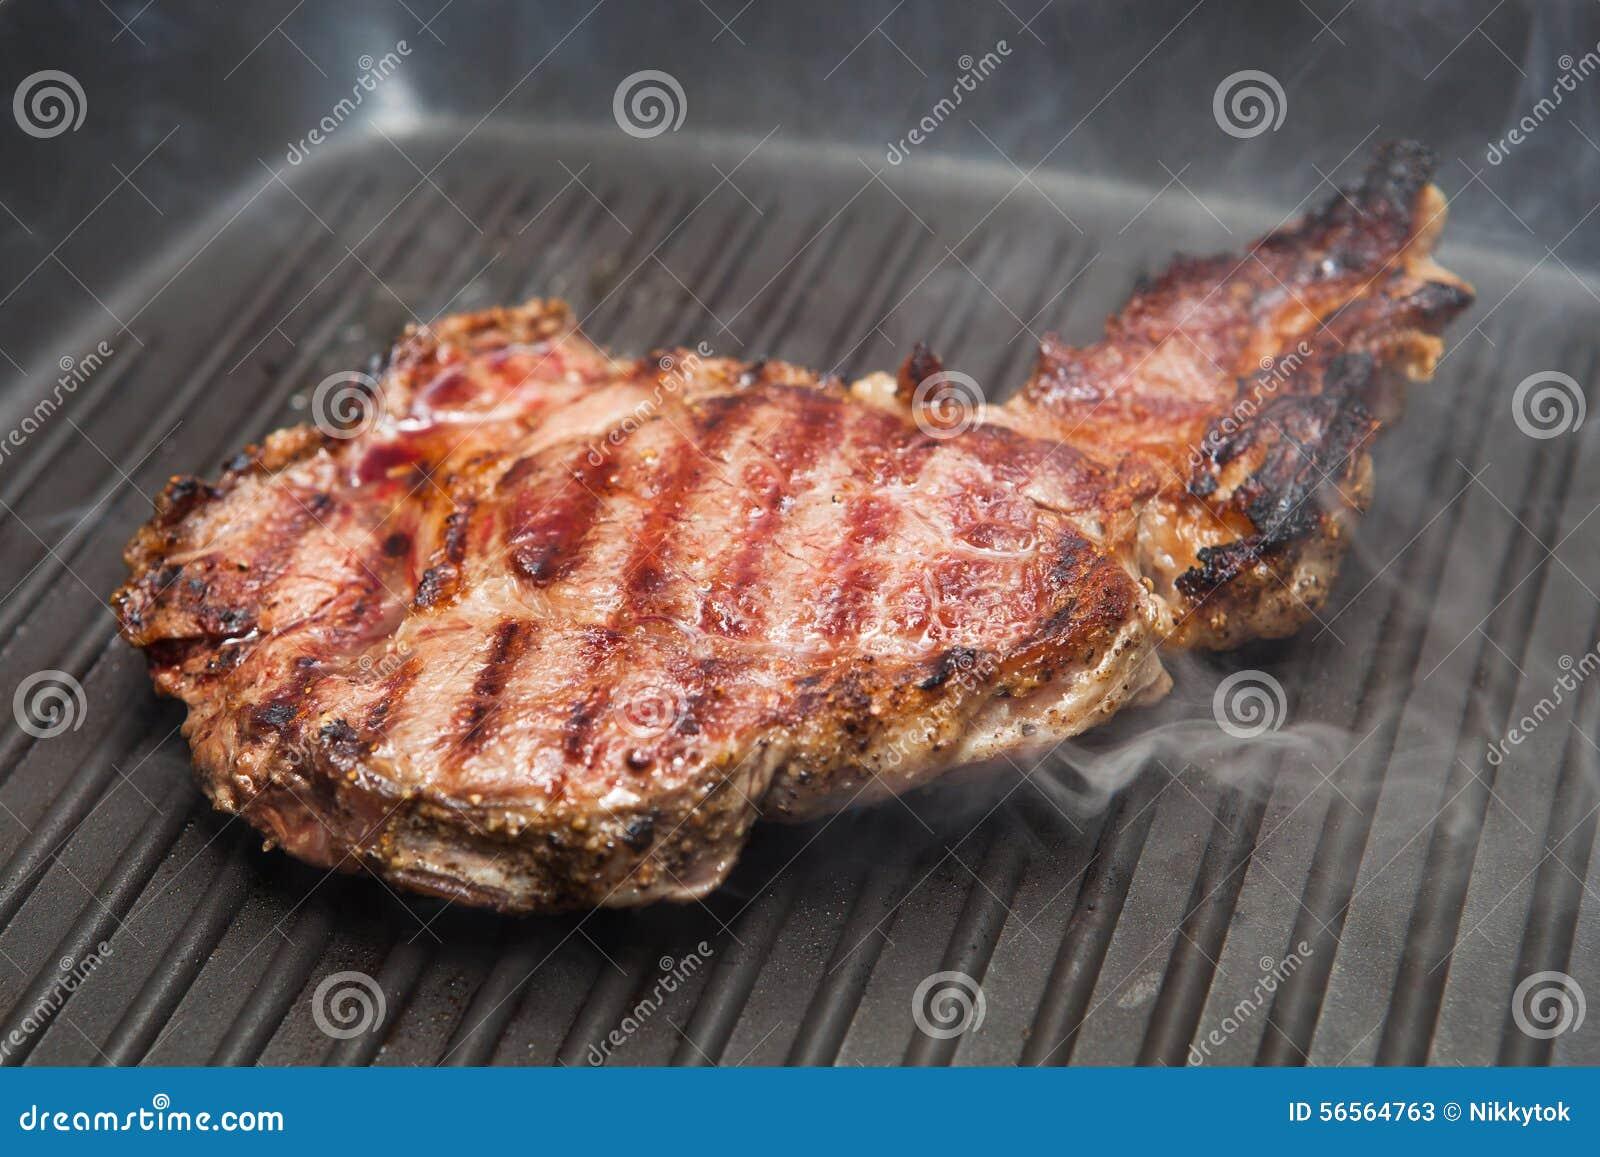 Download Τηγανίζοντας μπριζόλα βόειου κρέατος σε ένα τηγάνι σχαρών Στοκ Εικόνα - εικόνα από εύγευστος, αδελφών: 56564763